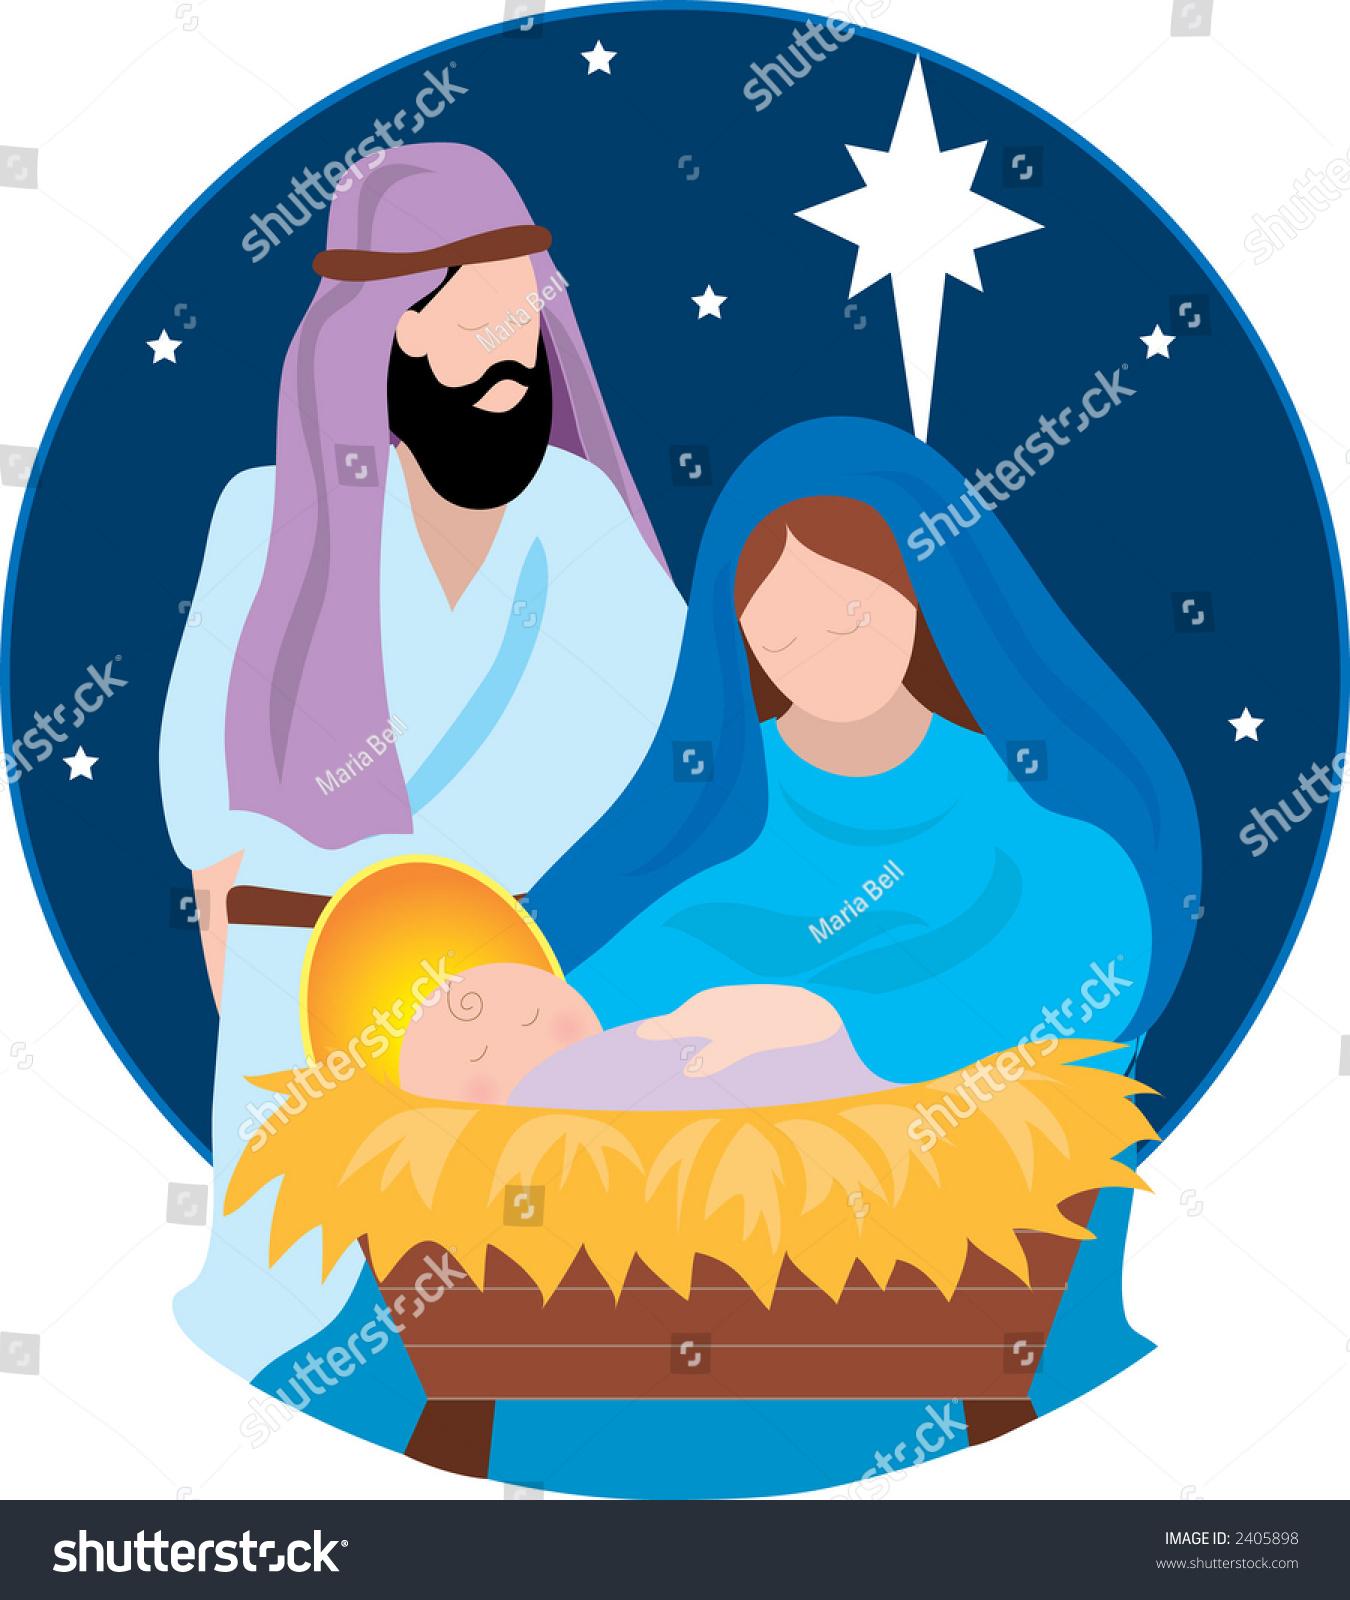 Nativity Scene Maryjoseph Baby Jesus Stock Vector Royalty Free 2405898